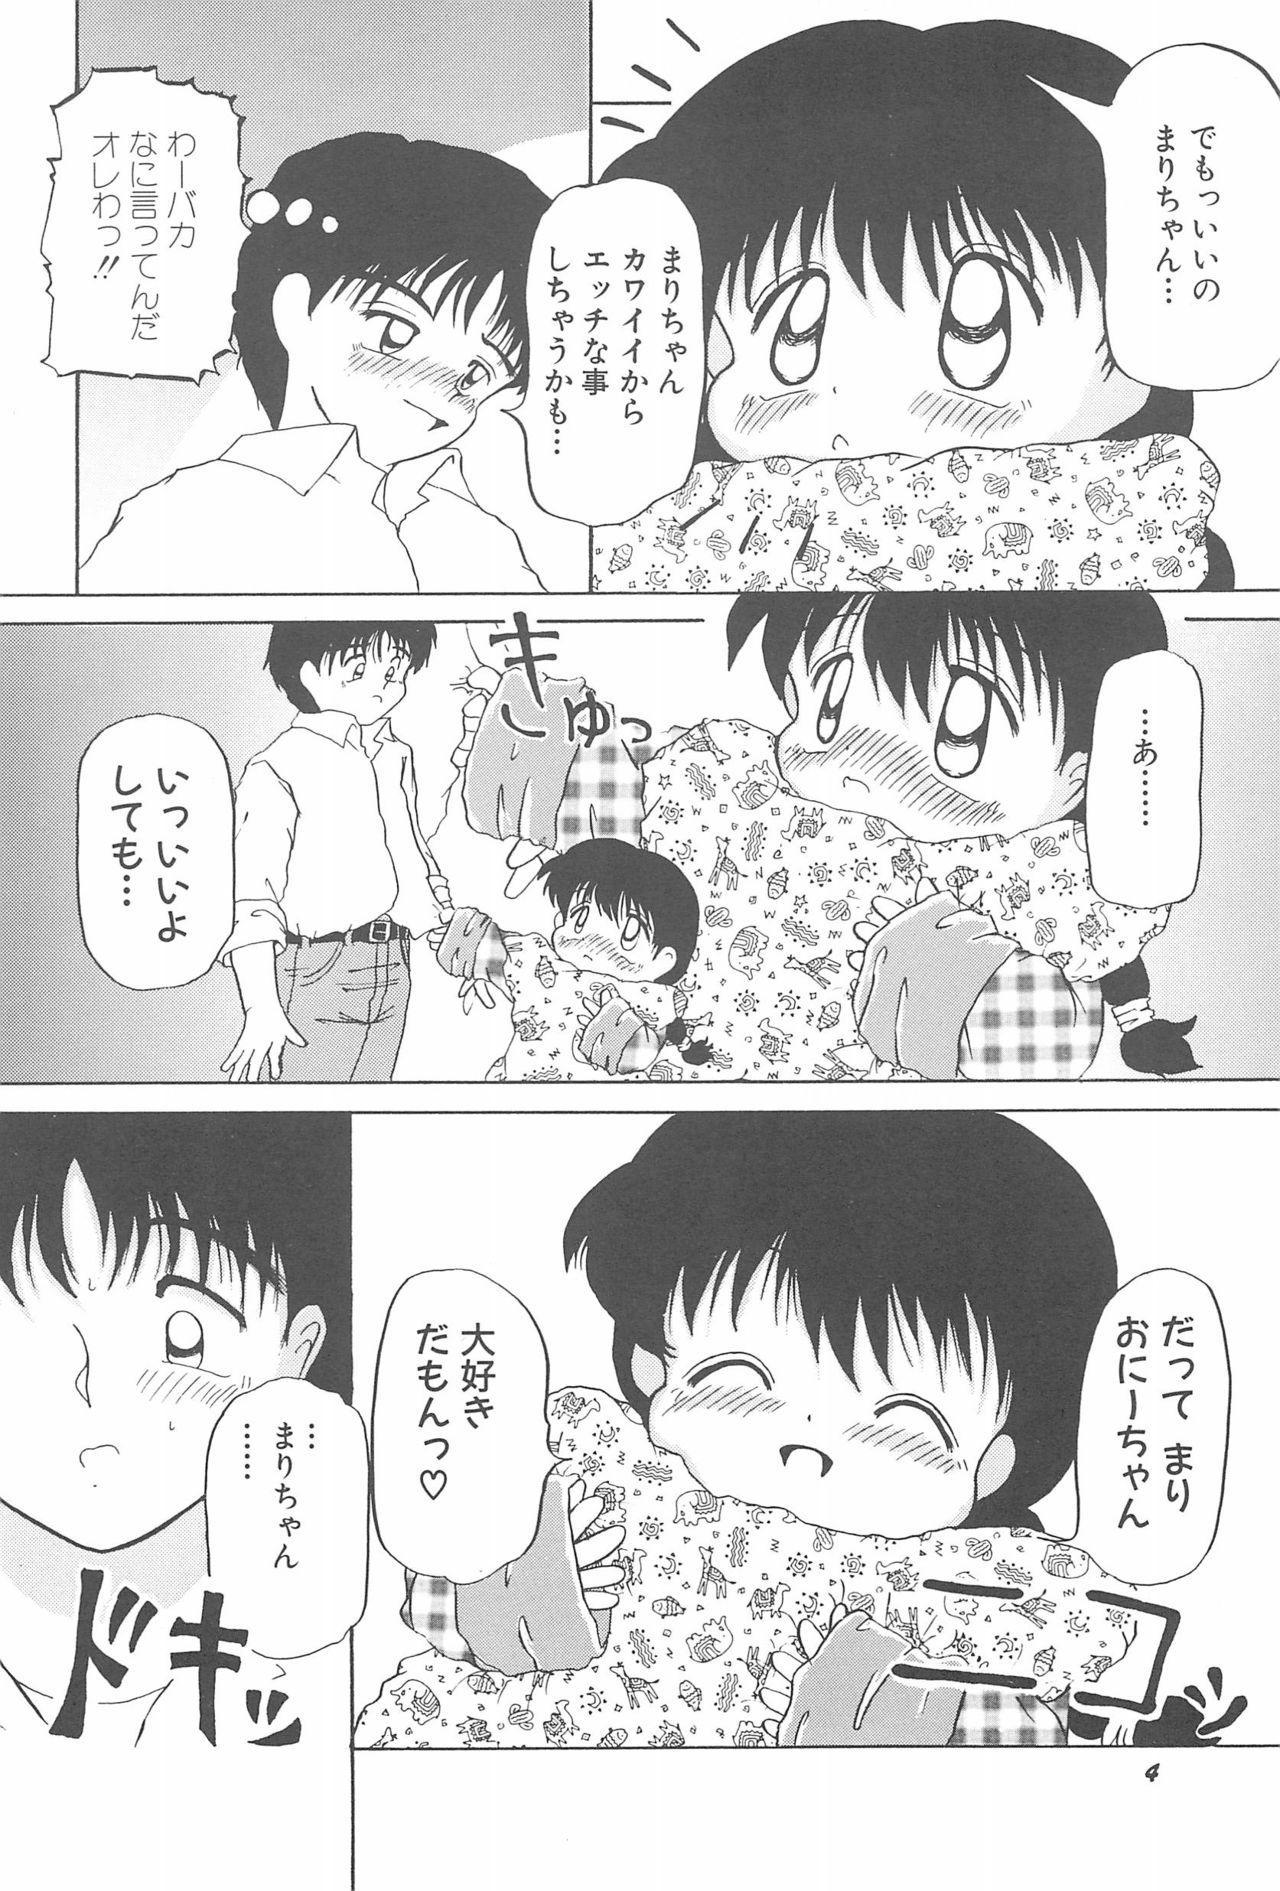 Aoi Shojokyuu 9